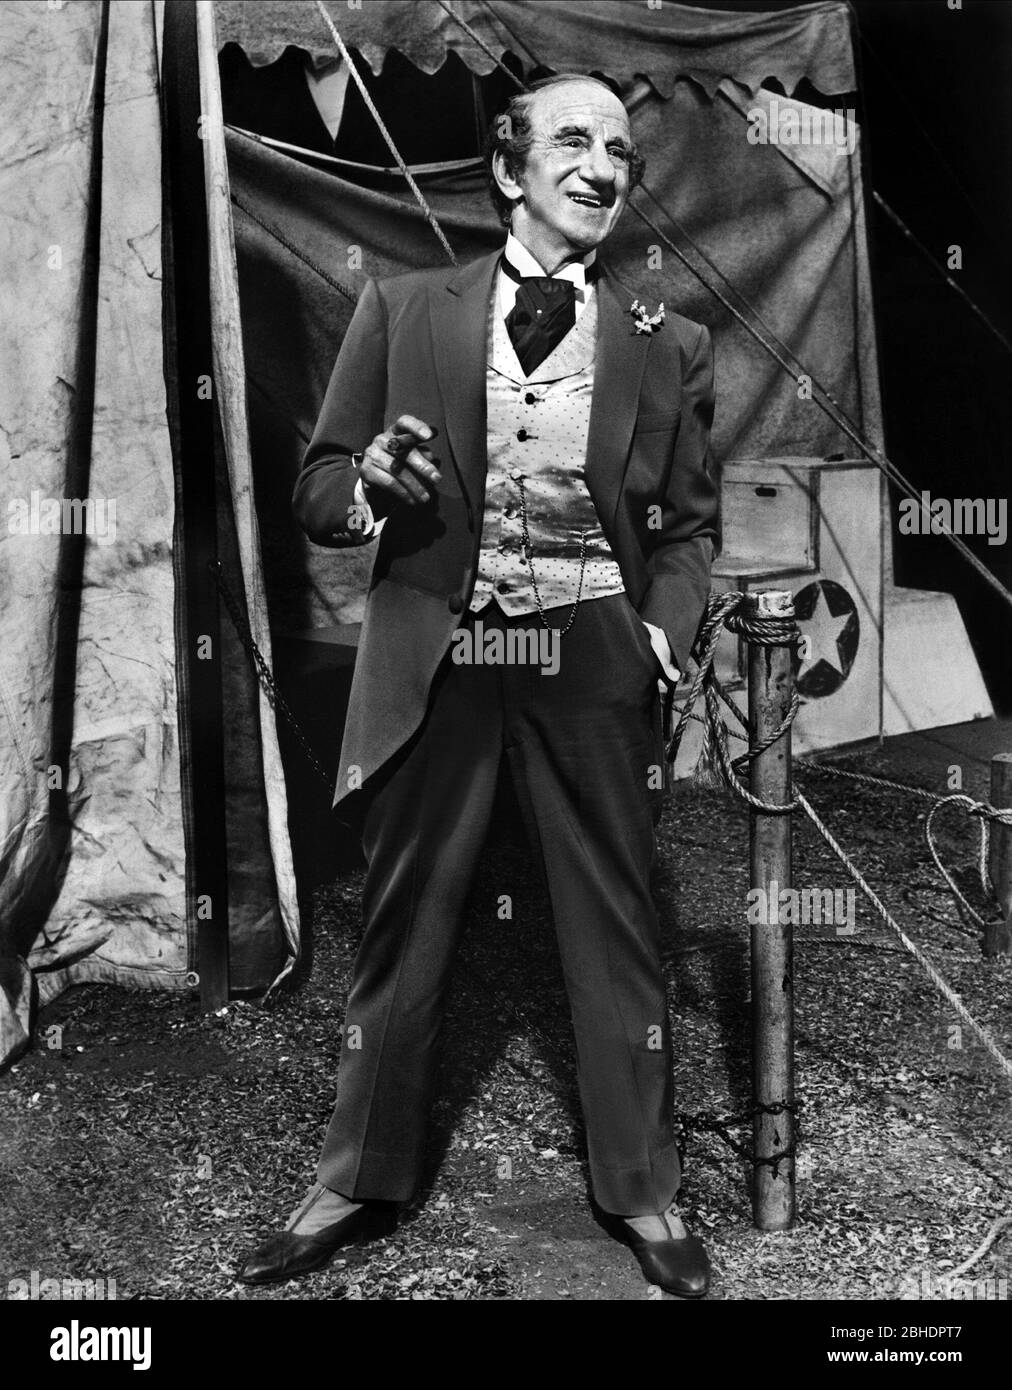 JIMMY DURANTE, BILLY ROSE'S JUMBO, 1962 Stock Photo